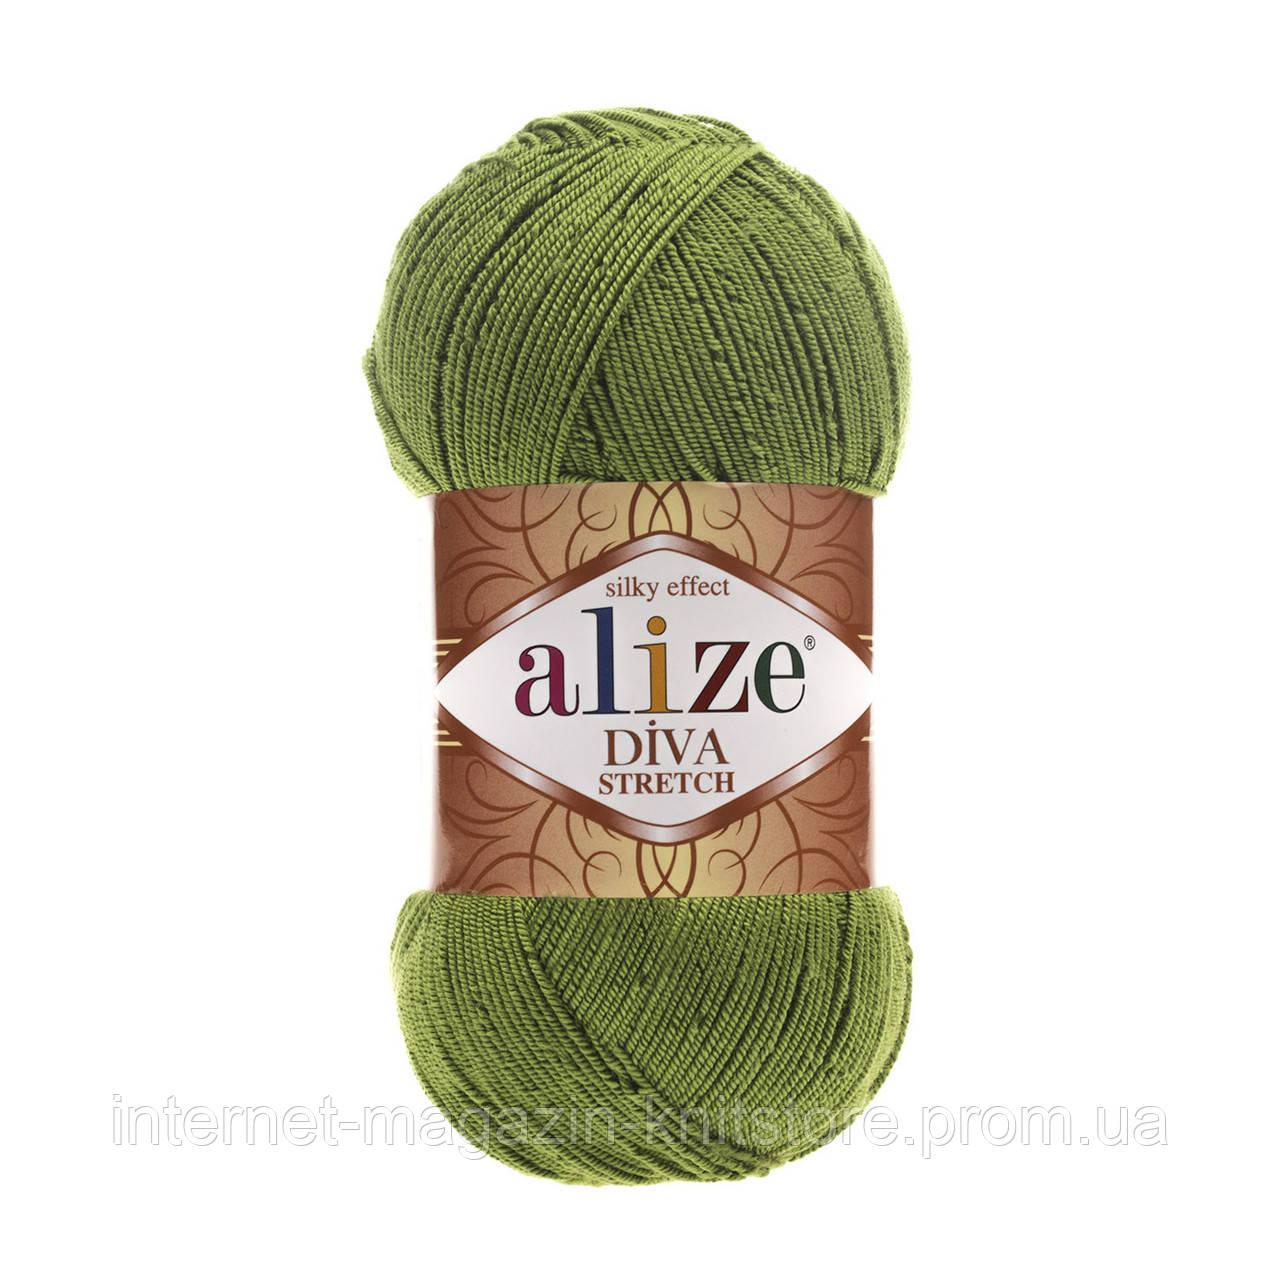 Пряжа Alize Diva Stretch Зеленый